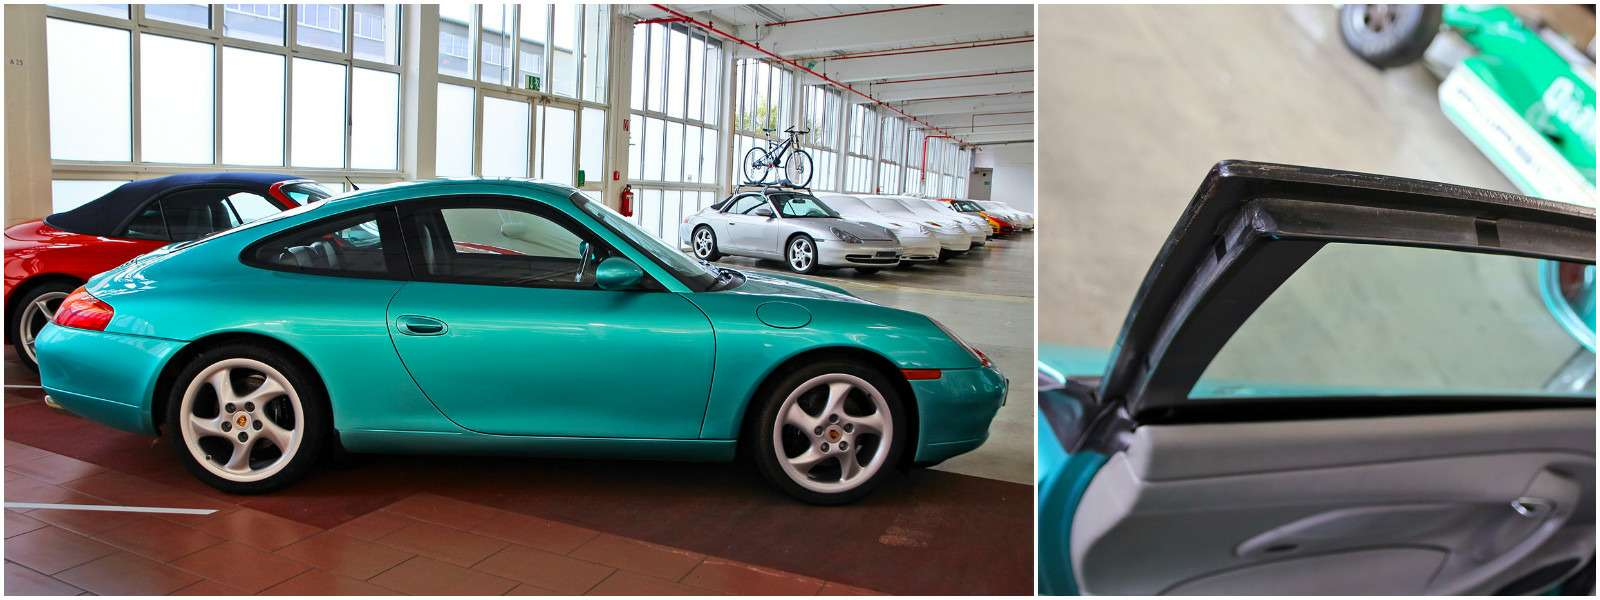 Секретный гараж Porsche: Лада Самара идругие— фото 700192